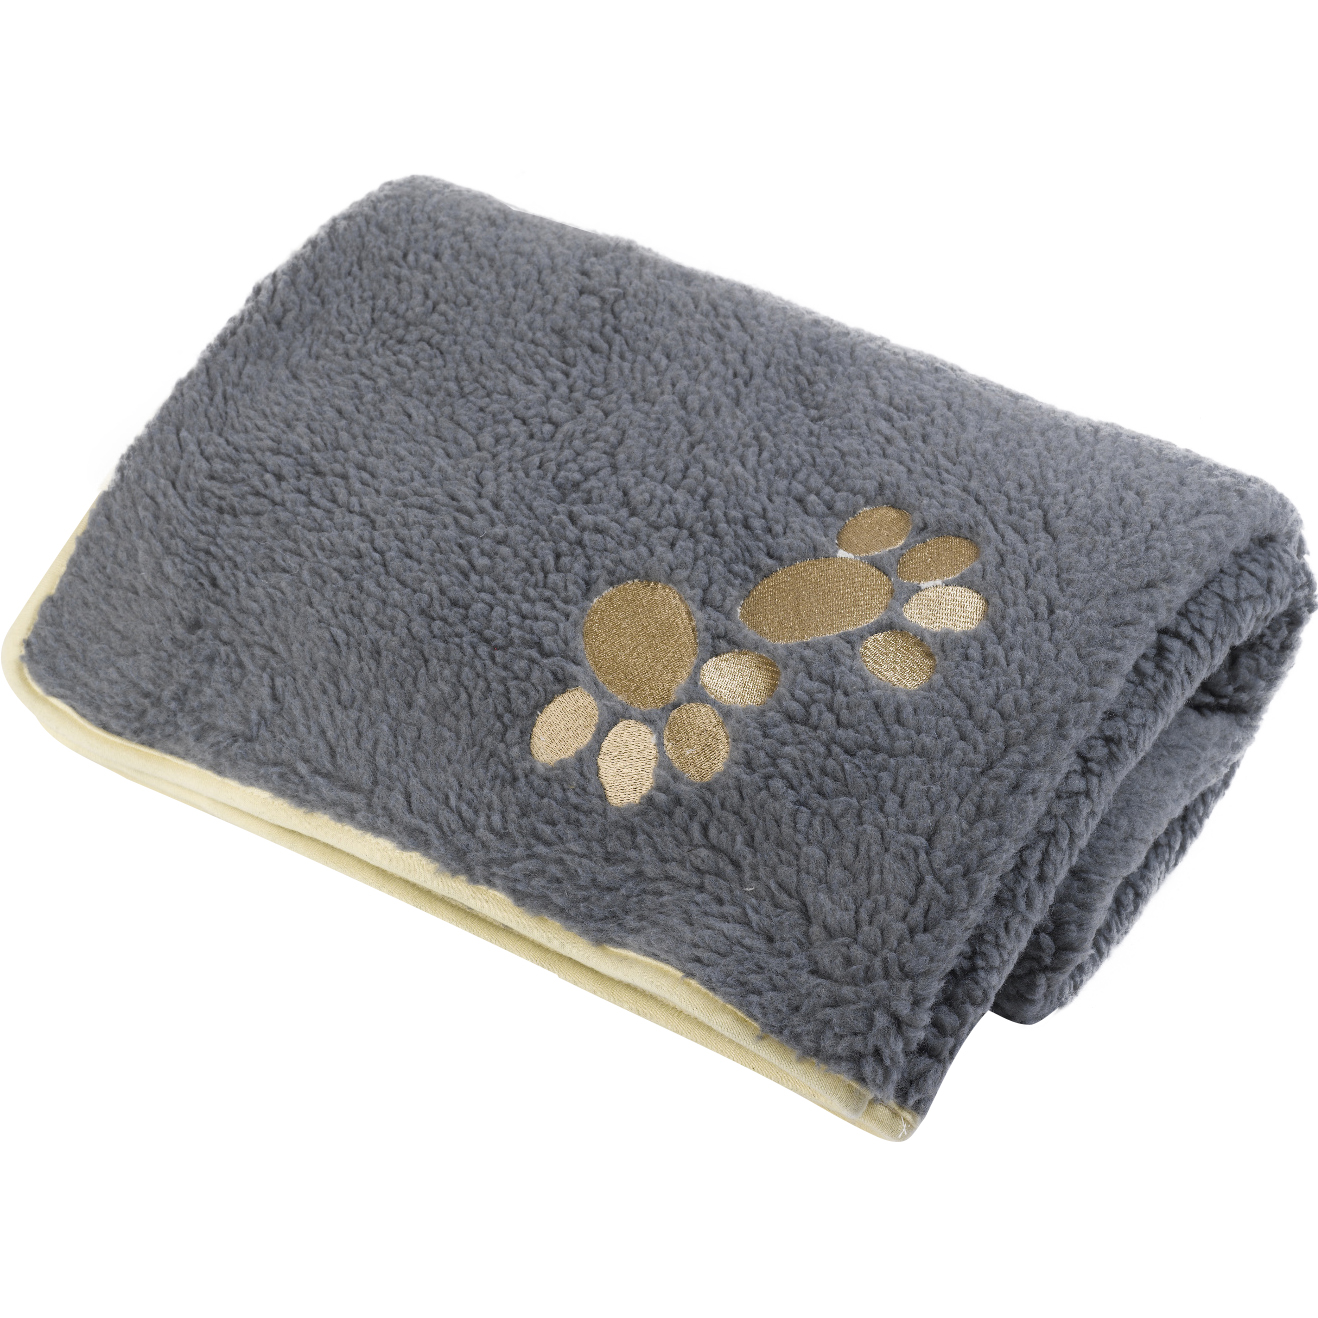 Pet face soft sherpa fleece dog blanket warm cosy paw for Sherpa blanket